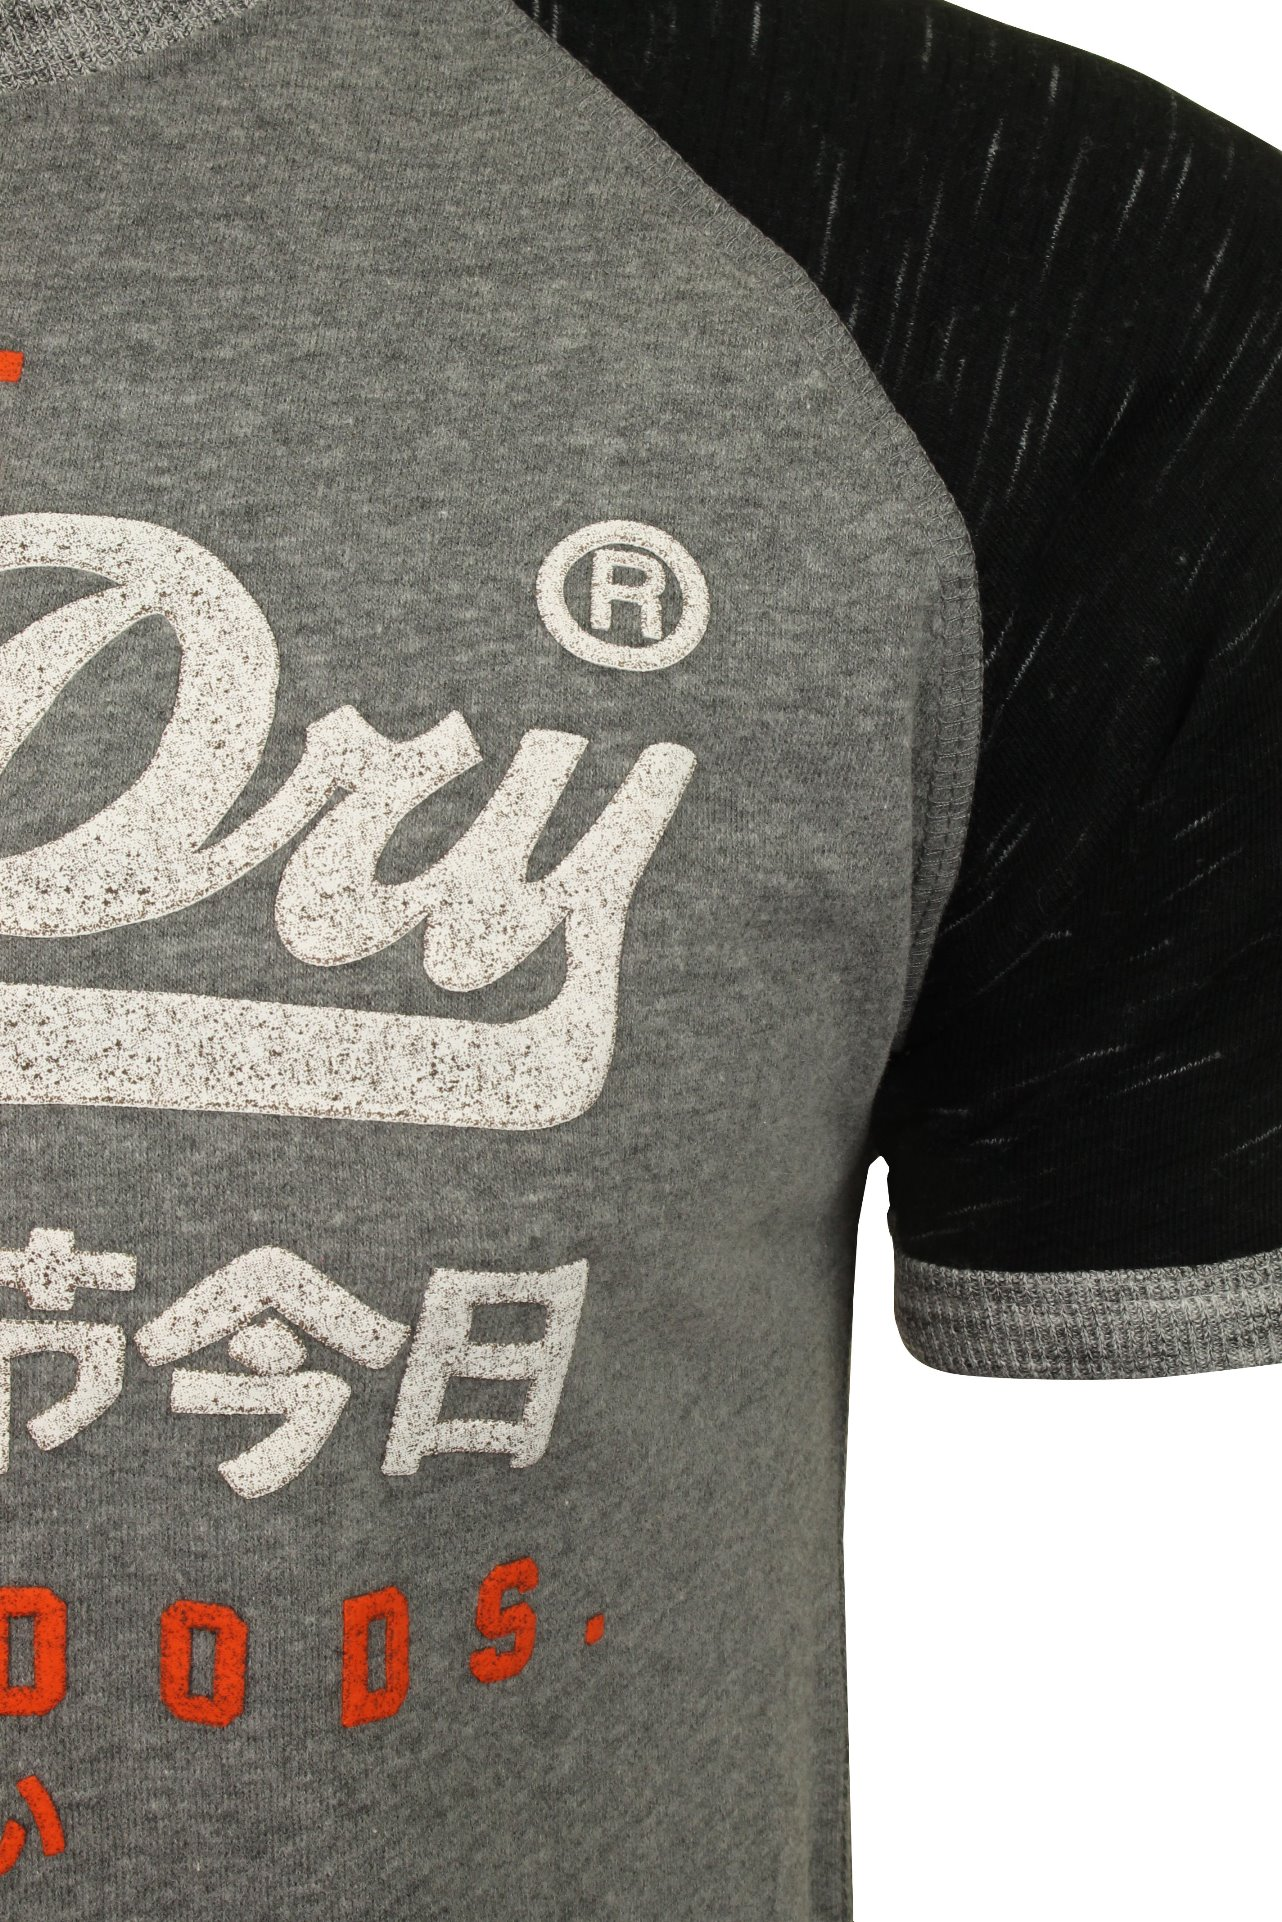 Superdry-T-shirt-homme-034-Premium-Goods-Raglan-Tee-034-a-Manches-Courtes miniature 7